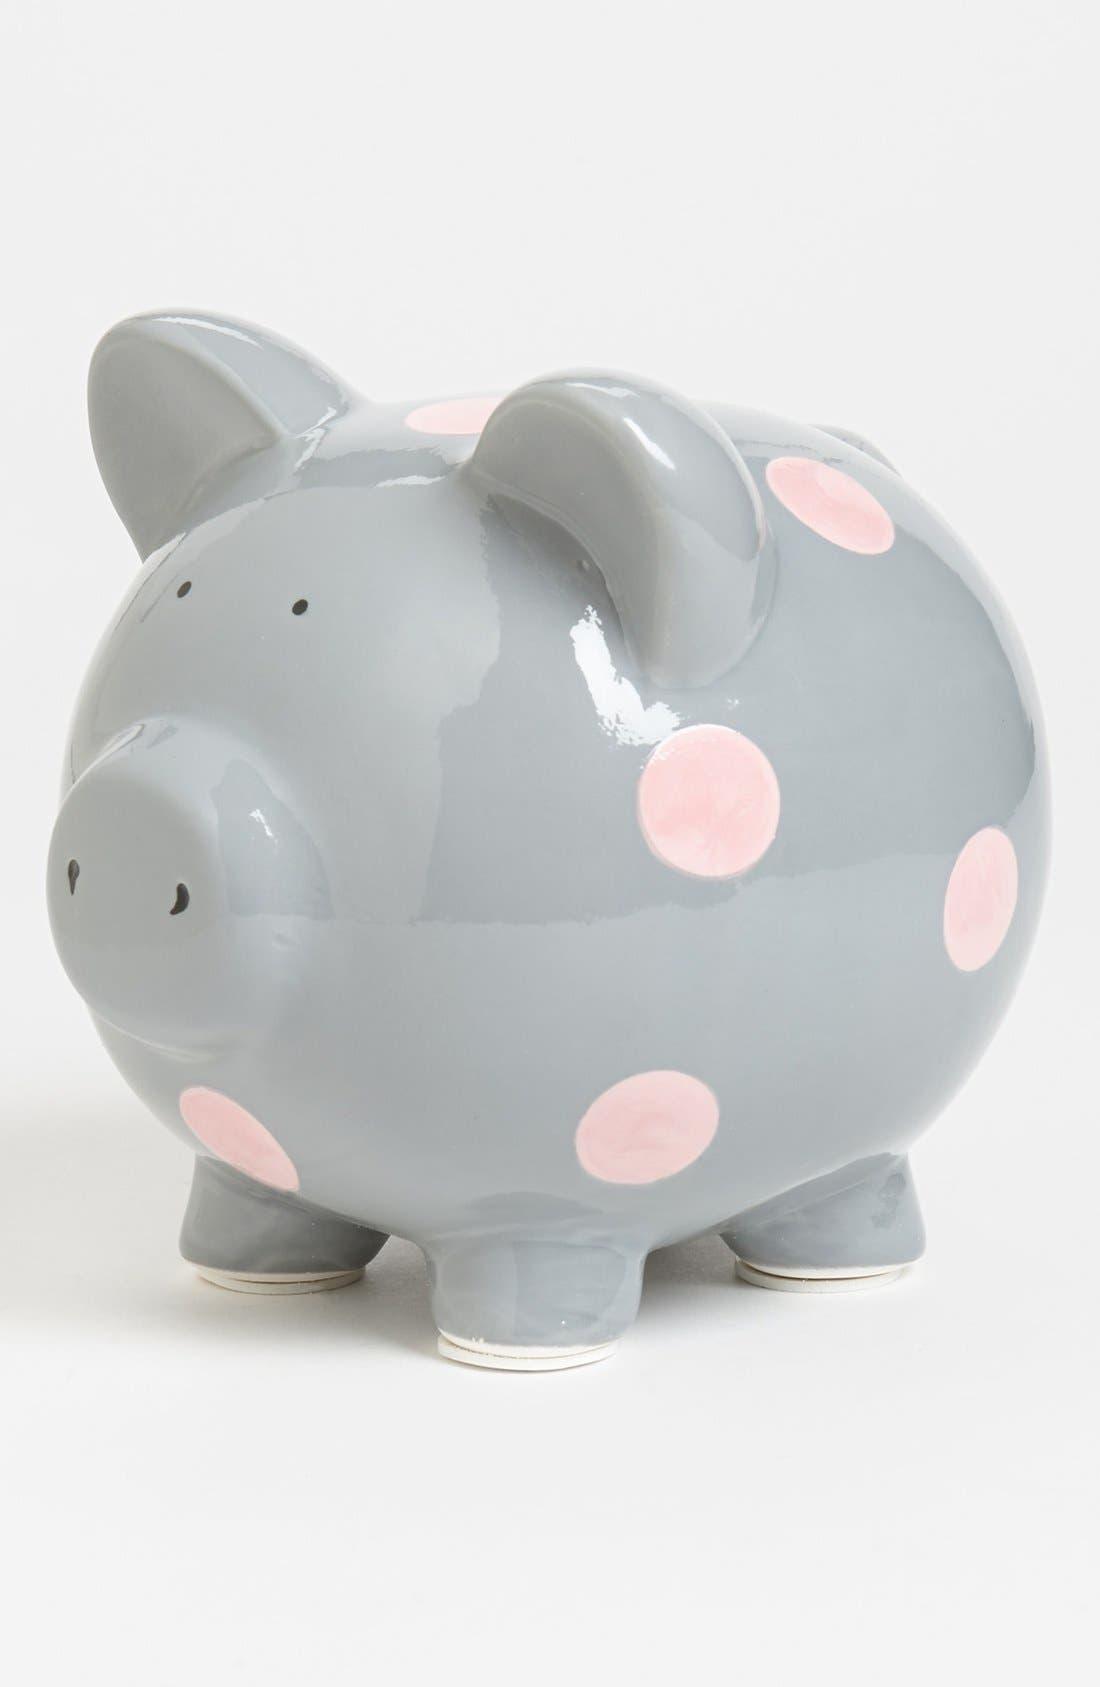 Alternate Image 1 Selected - Elegant Baby 'Classic' Ceramic Piggy Bank